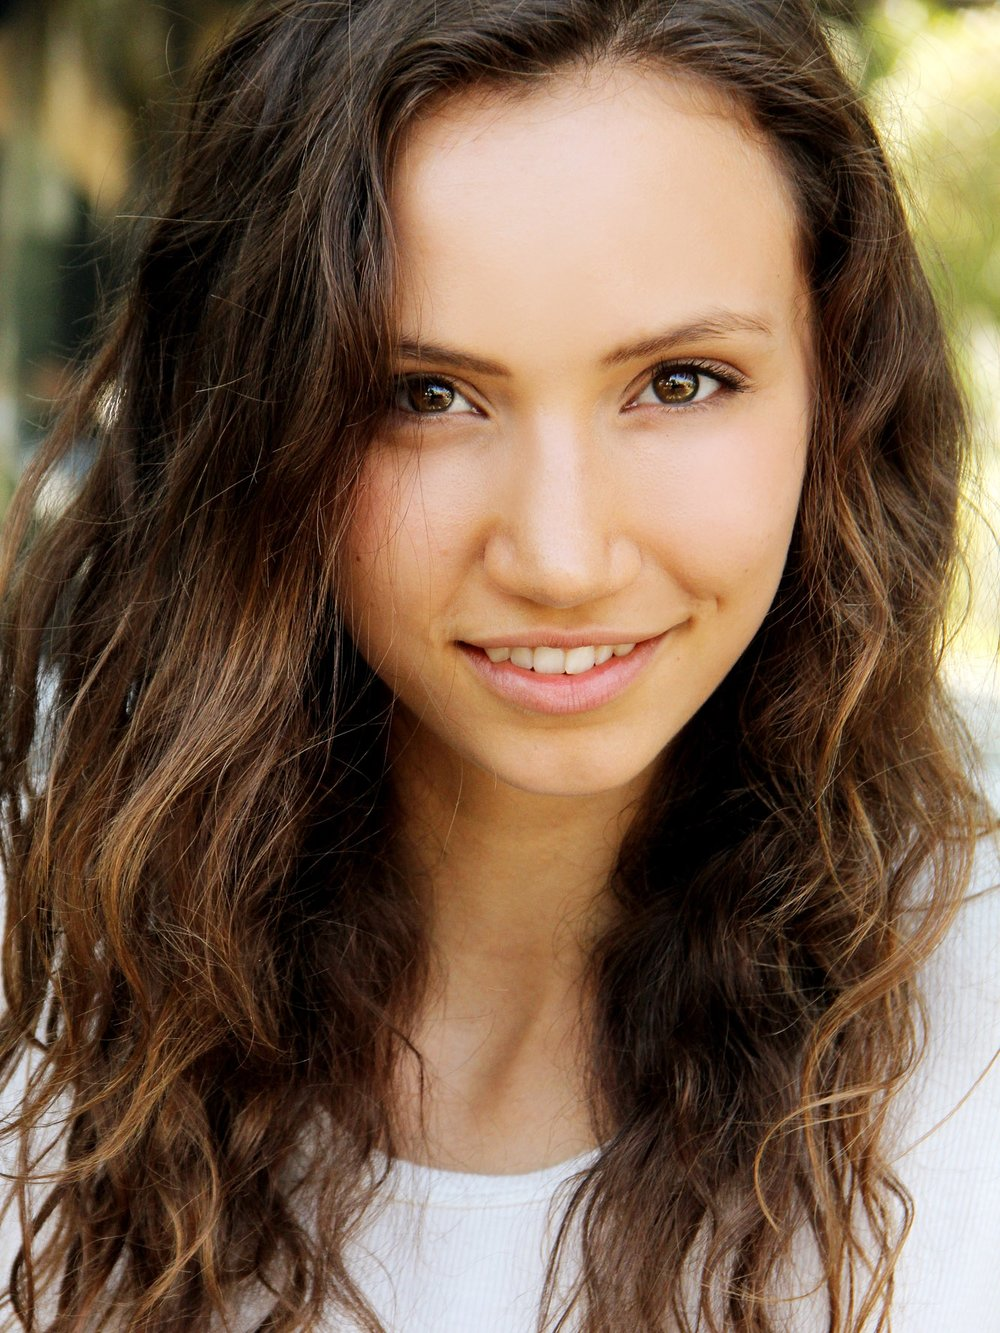 Aja - Height: 5'9Origin: PortlandBio: Friendly model/ actress with a passion in Yoga & Dancing.